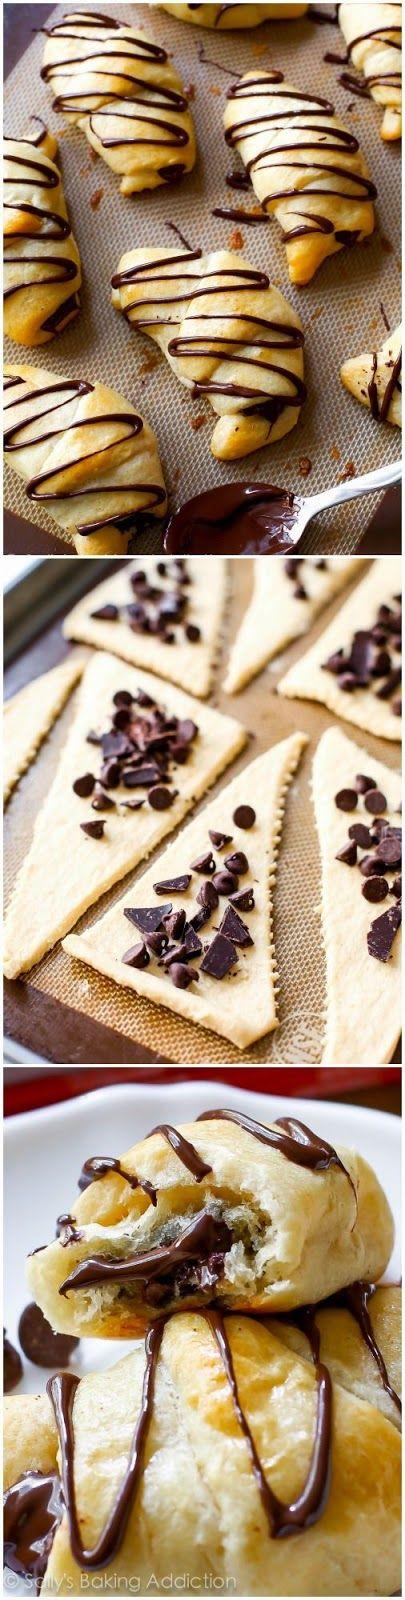 20 Minute #Chocolate #Croissants